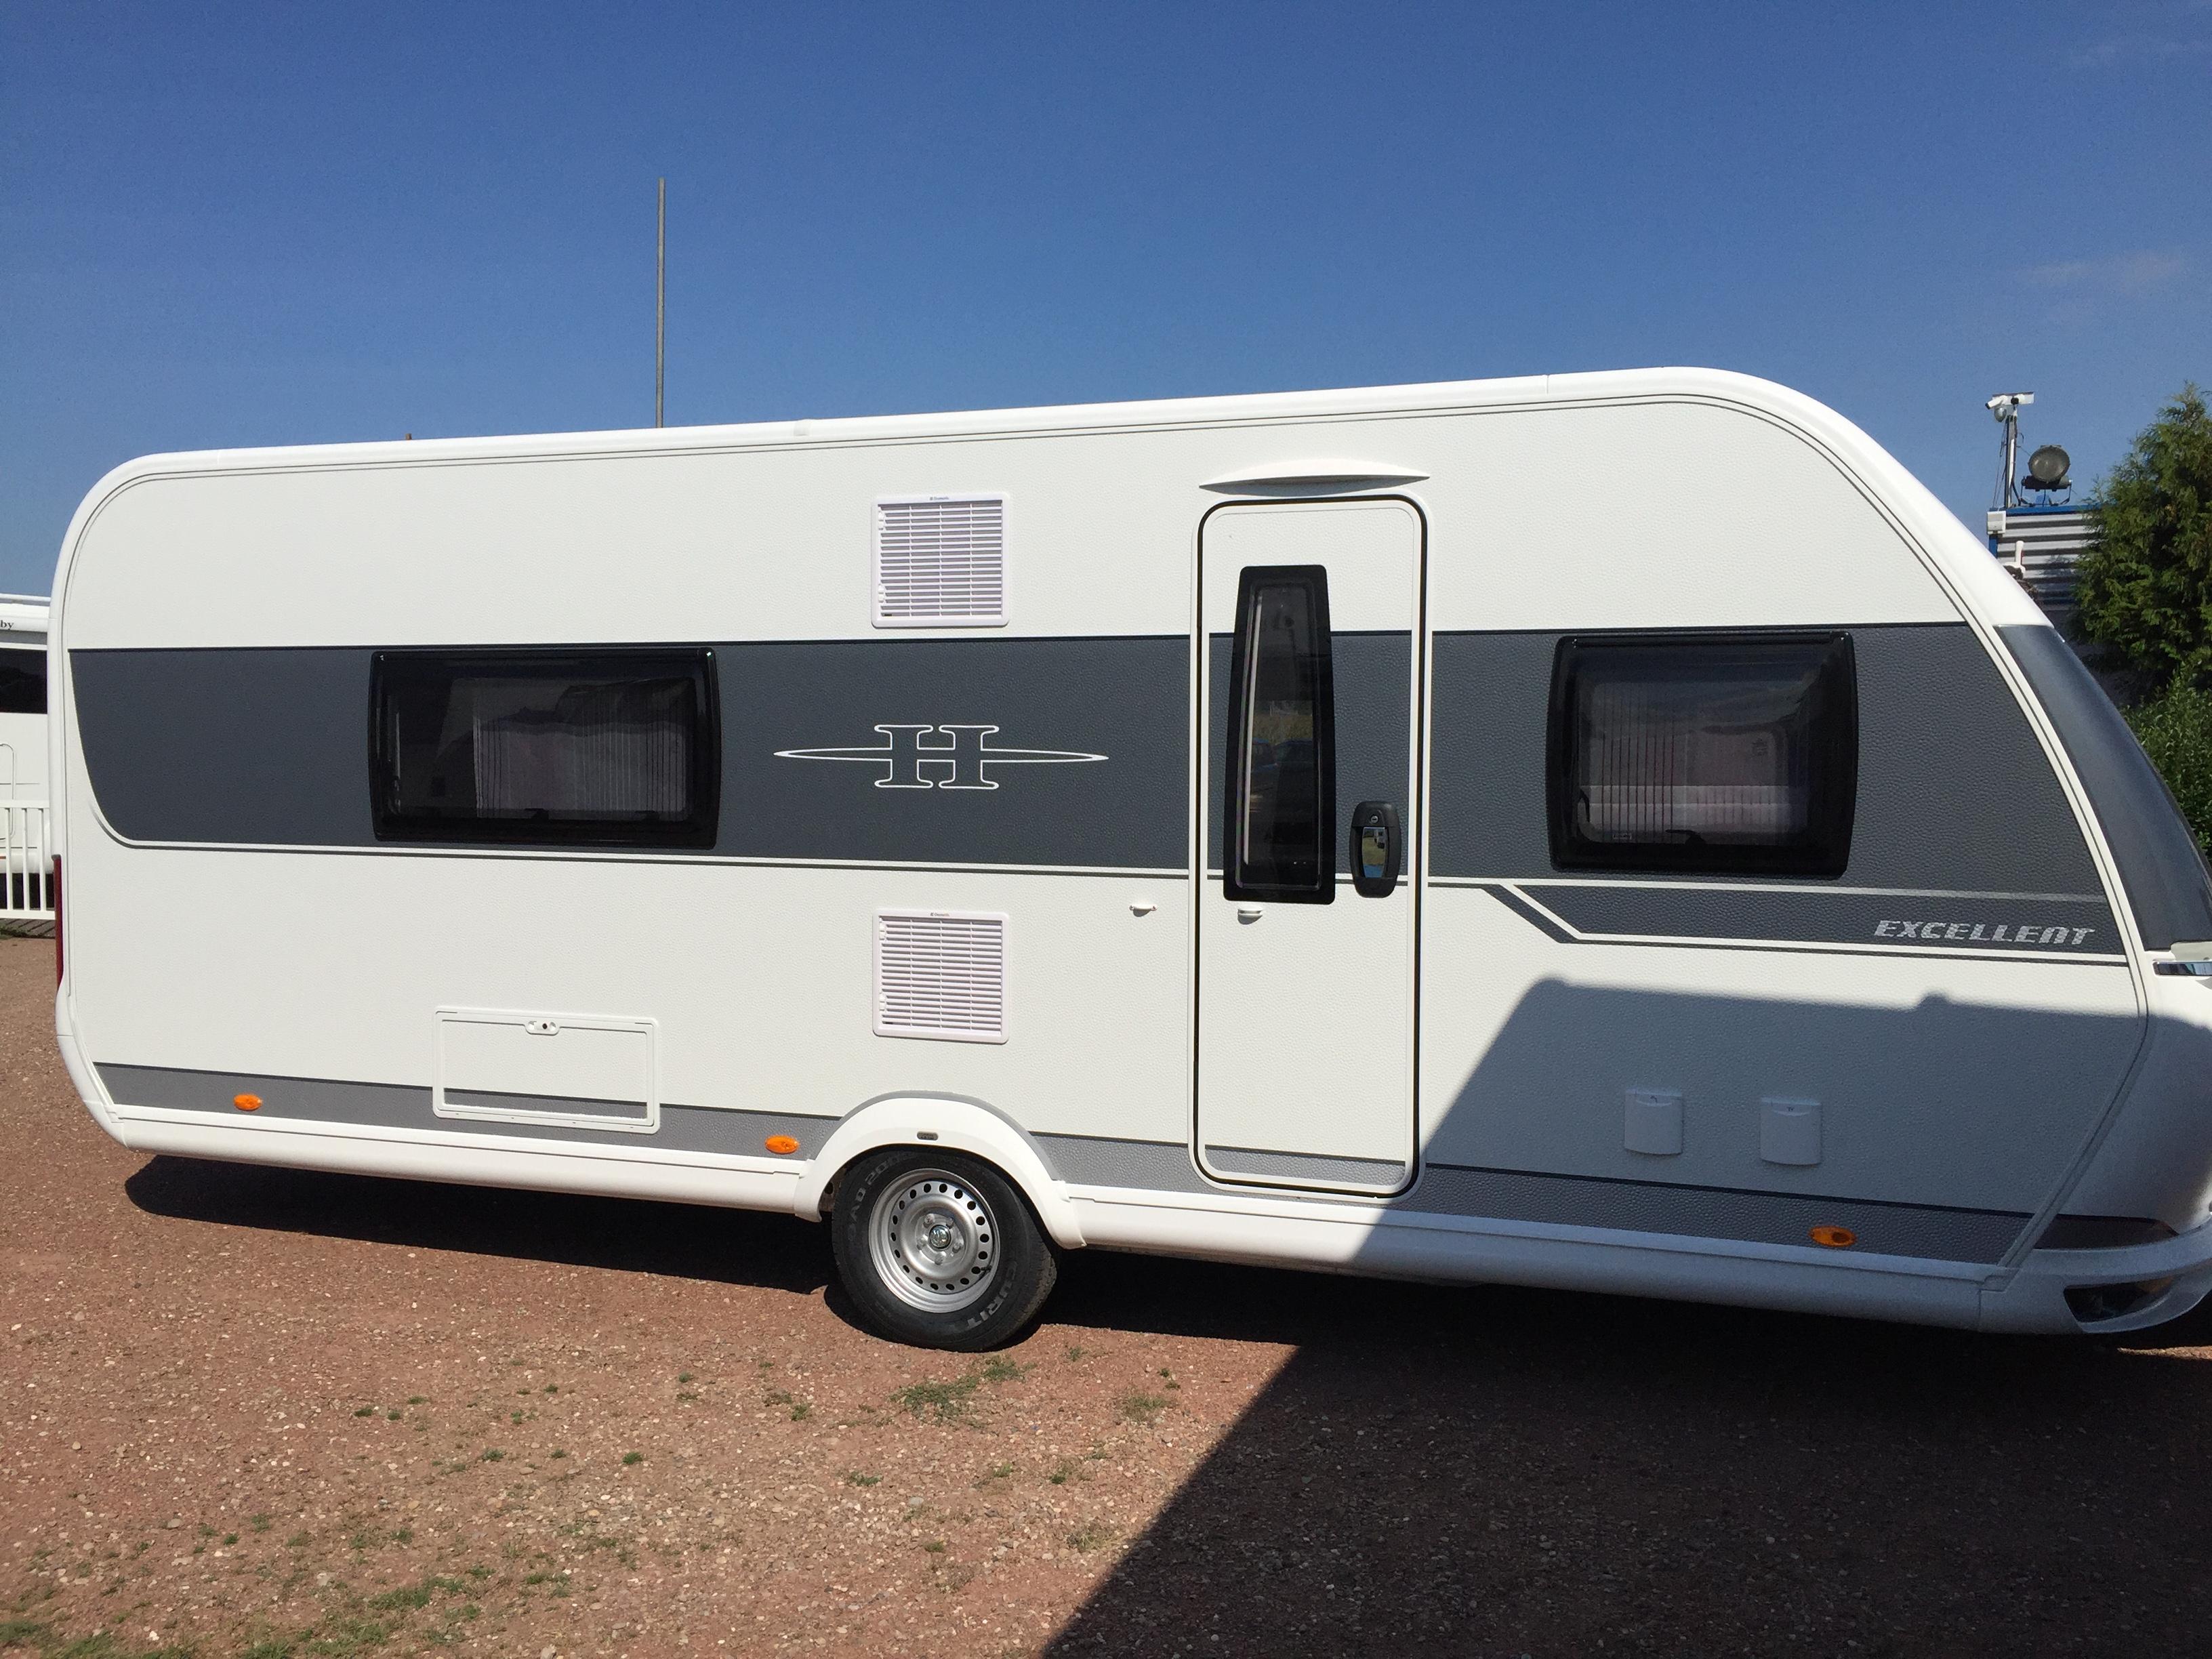 hobby 560 wfu excellent neuf de 2016 caravane en vente oberschaeffolsheim rhin 67. Black Bedroom Furniture Sets. Home Design Ideas